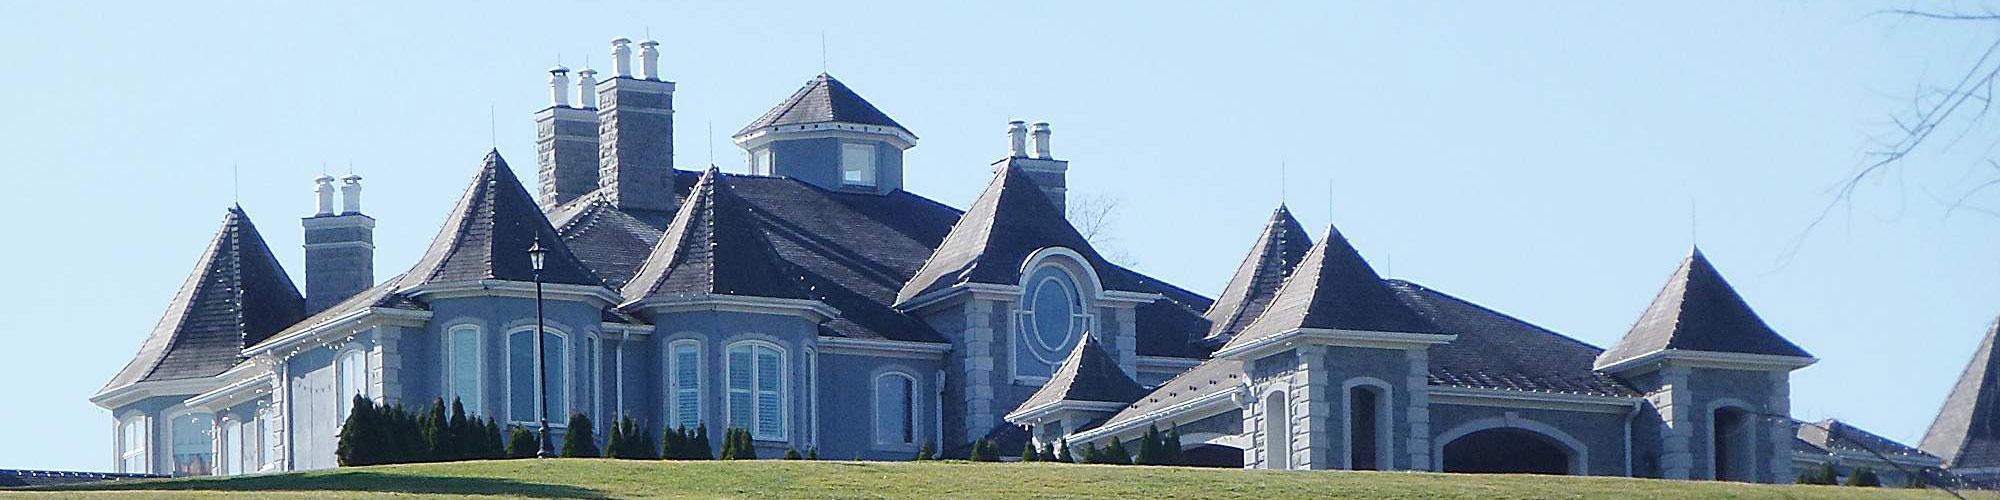 Large gray bungalow